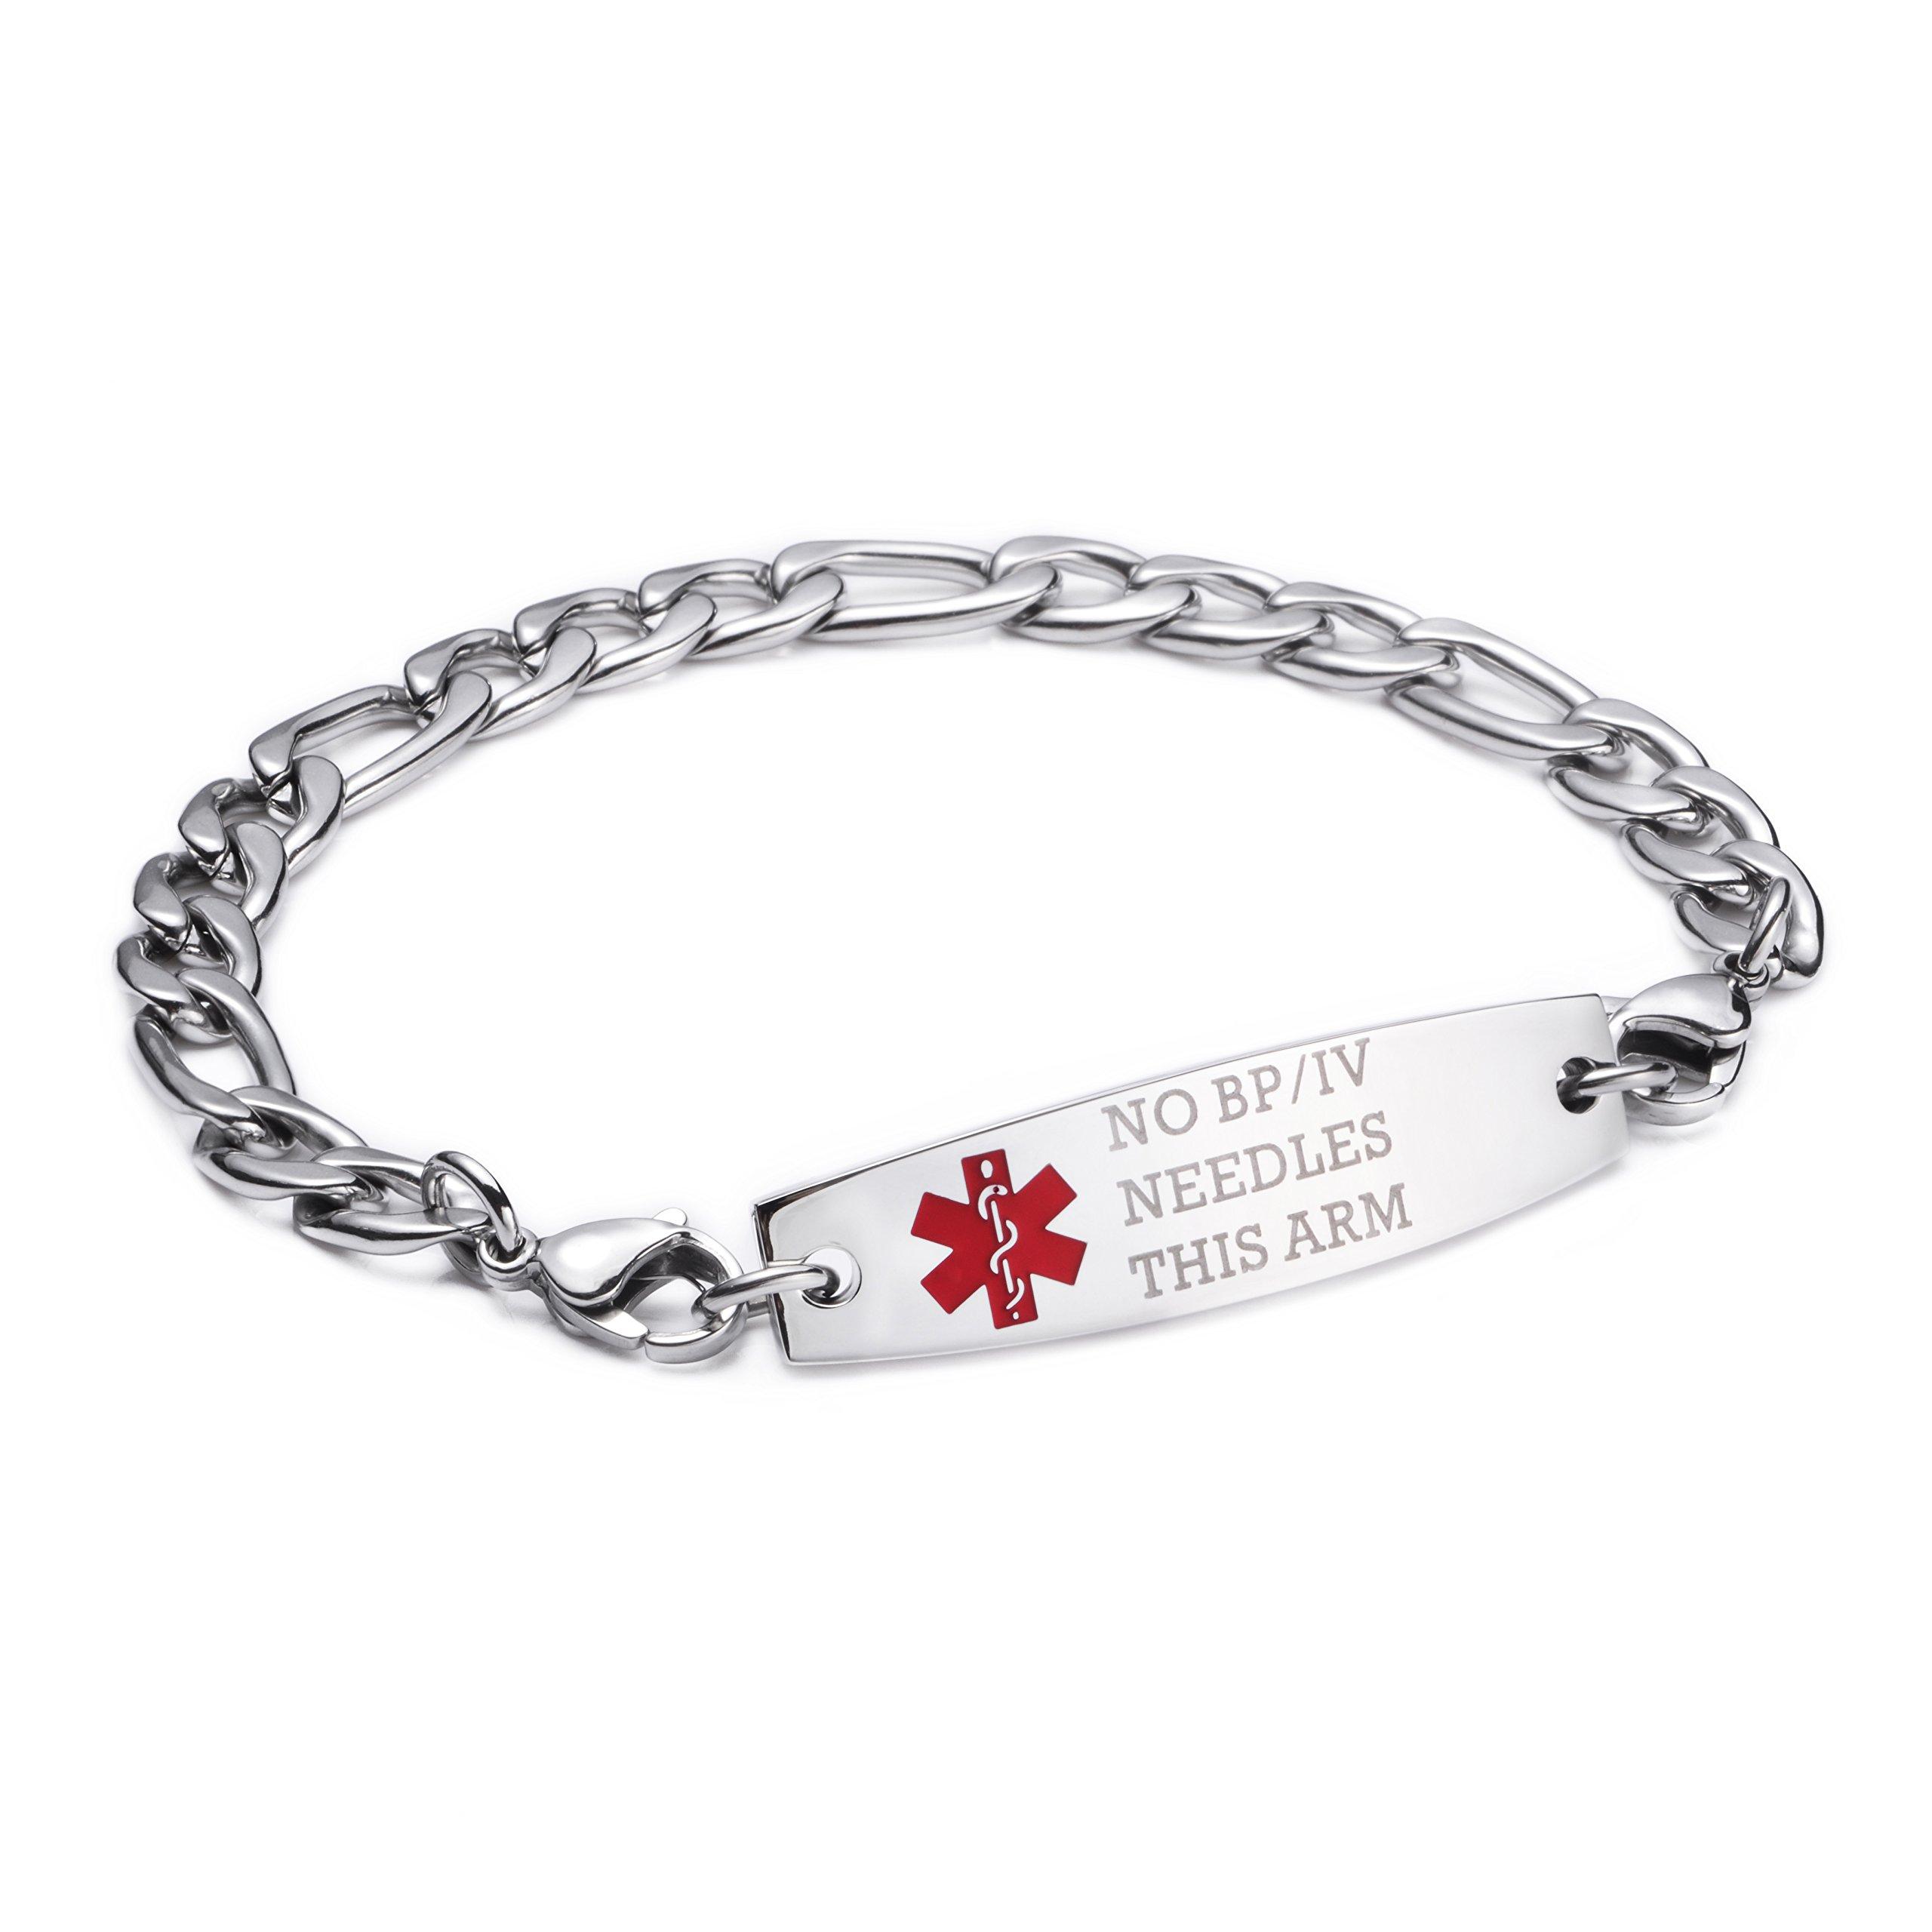 LinnaLove Stainless steel Figaro Chain lnterchangeable medical alert bracelets-Pre-engraving(NO BP/IV/NEEDLES THIS ARM/7.5'')